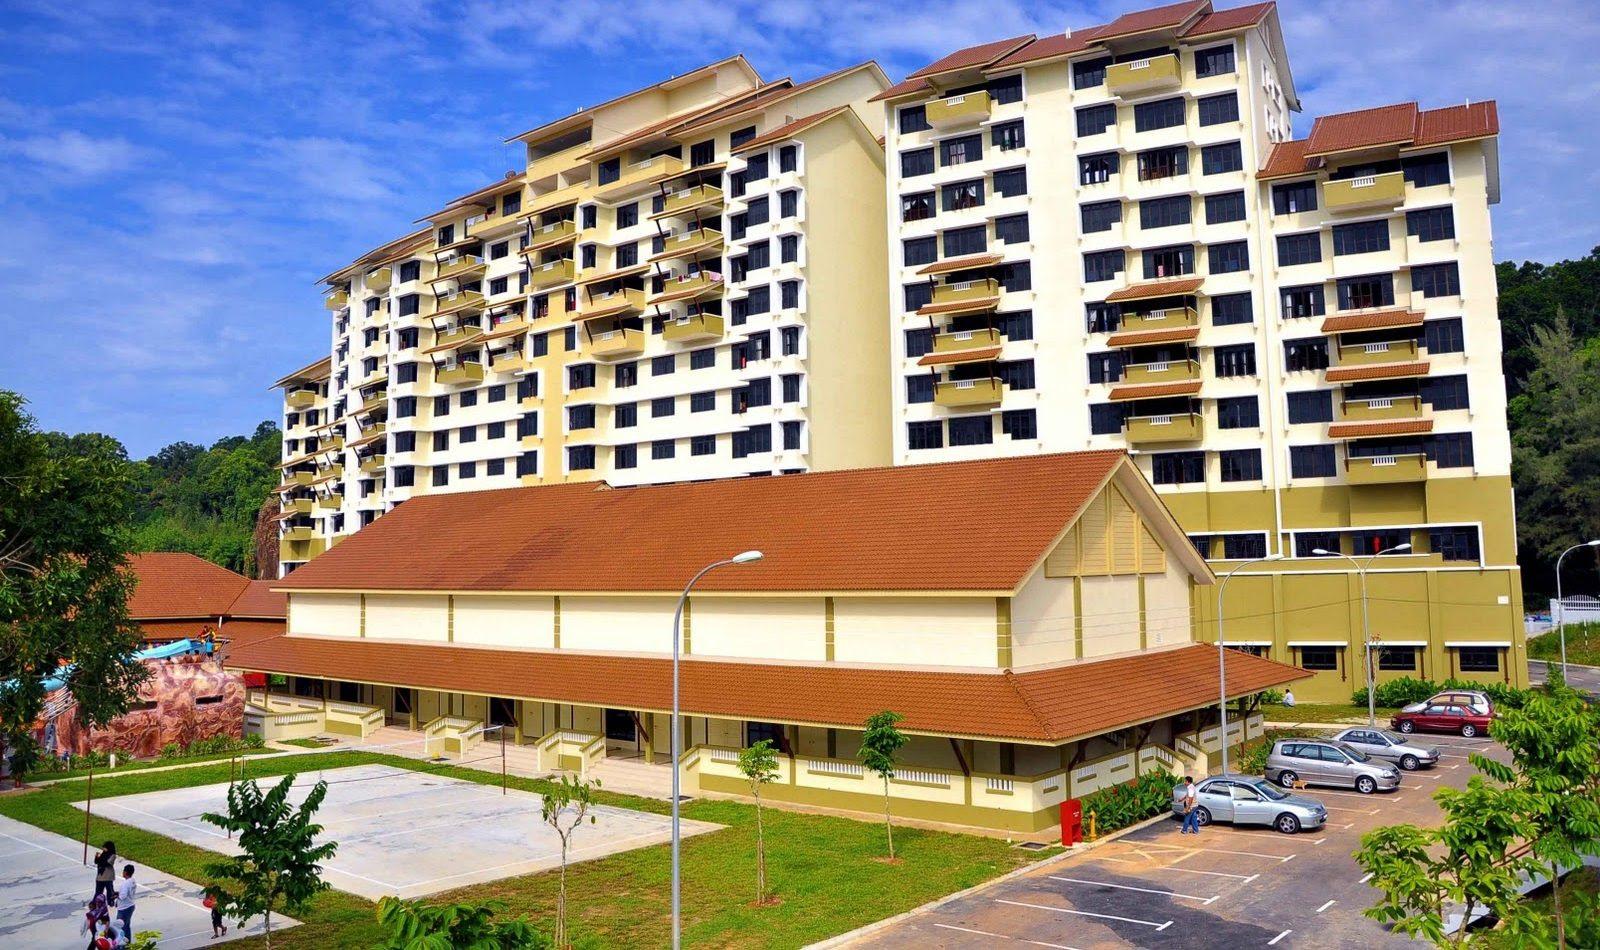 Rumah Peranginan Persekutuan Di Kelantan Rumah 408